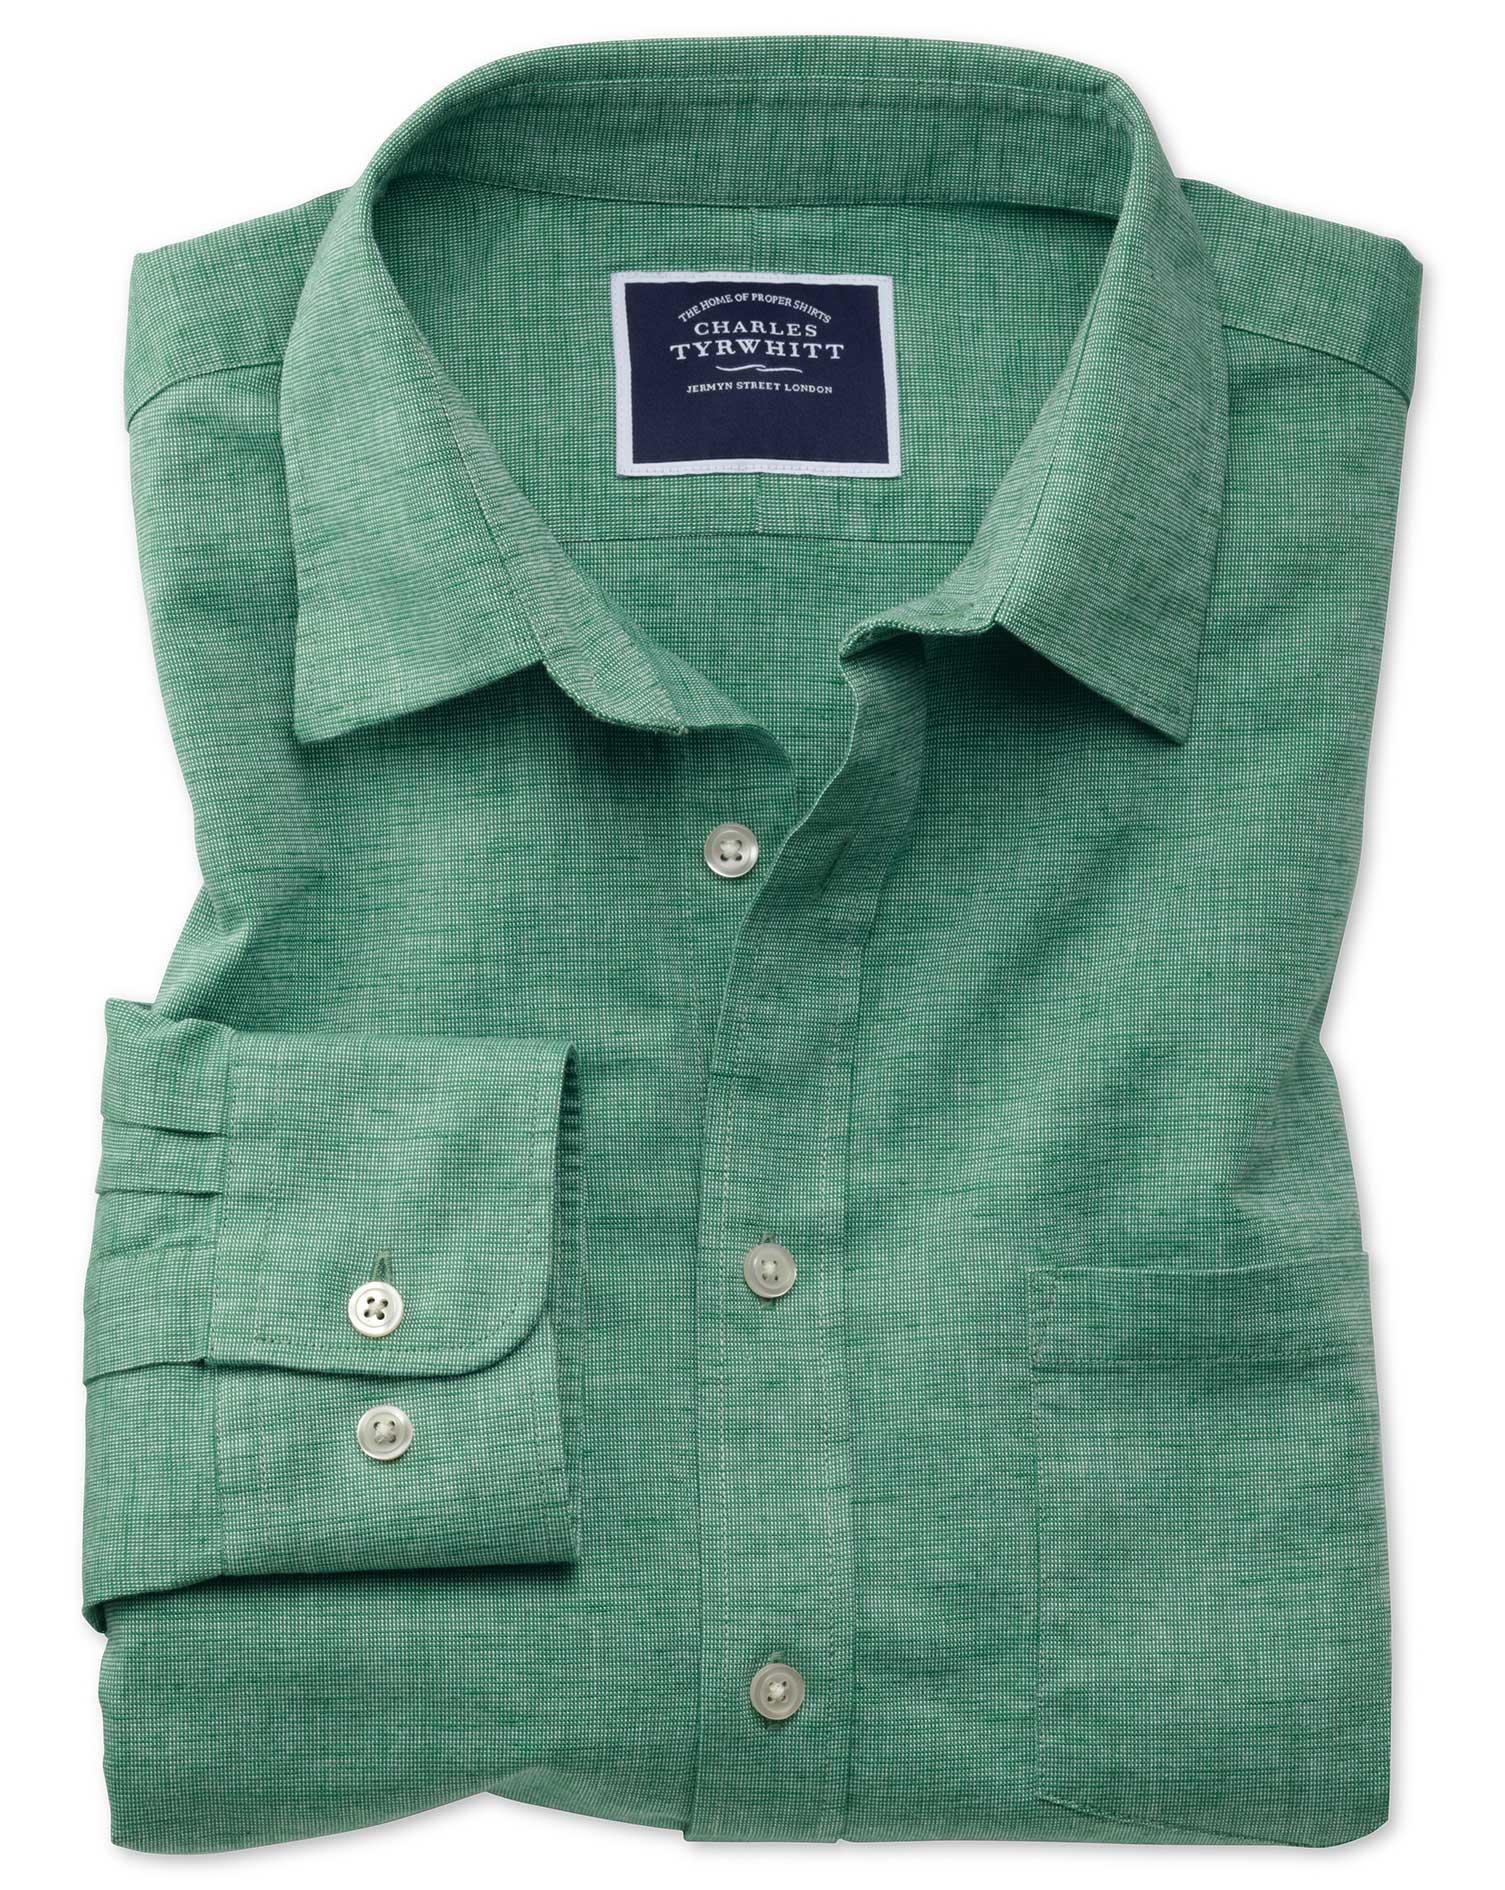 Slim Fit Cotton Linen Green Plain Shirt Single Cuff Size Small by Charles Tyrwhitt